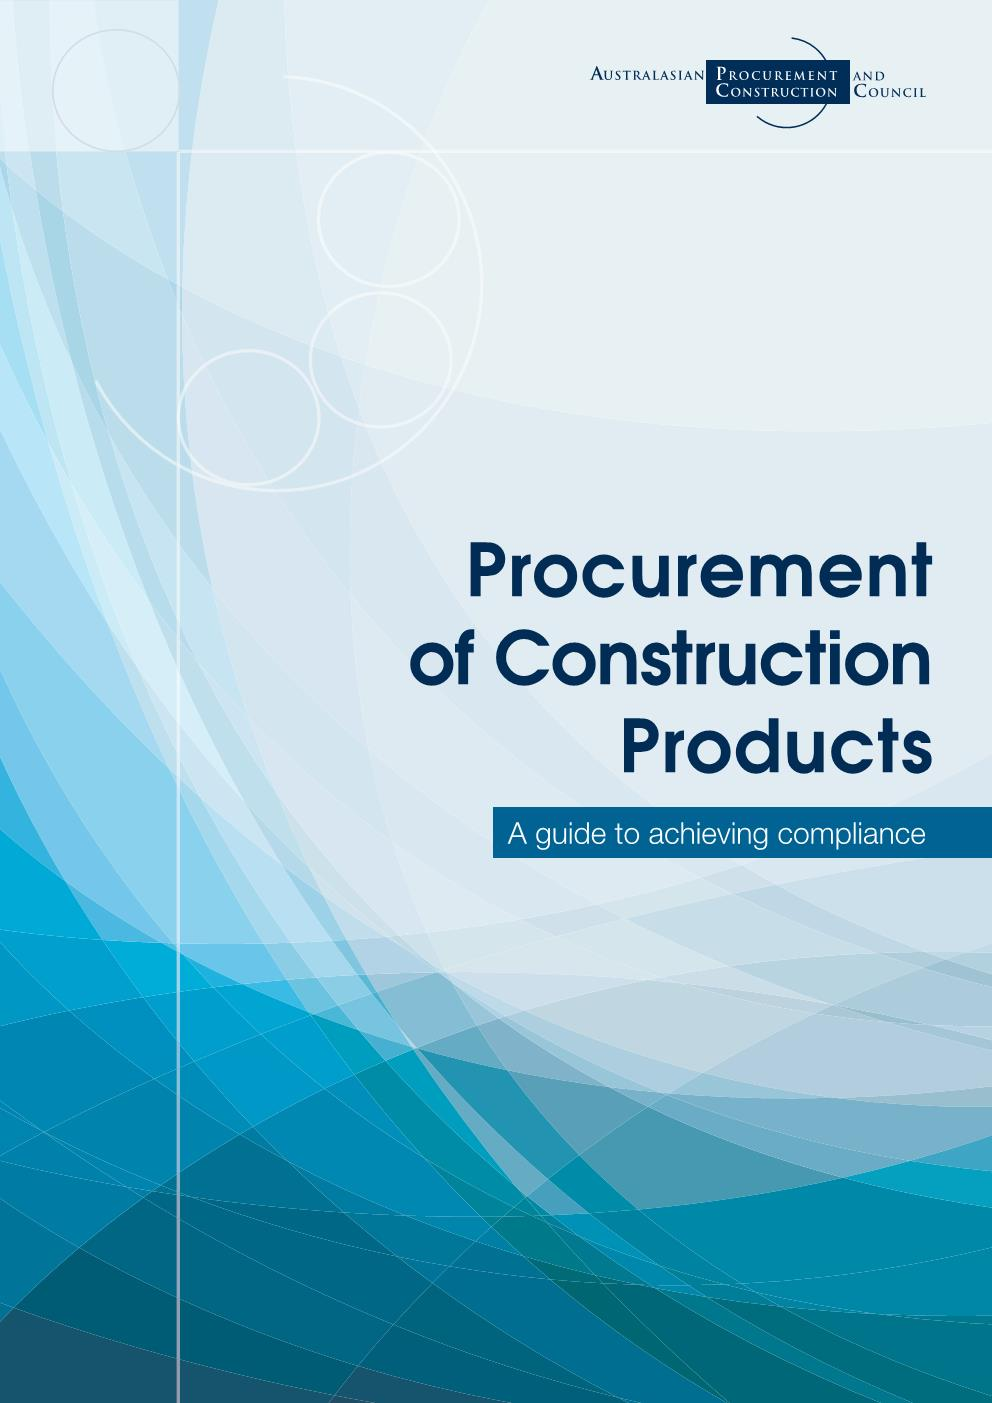 Property Council of Australia logo.jpg